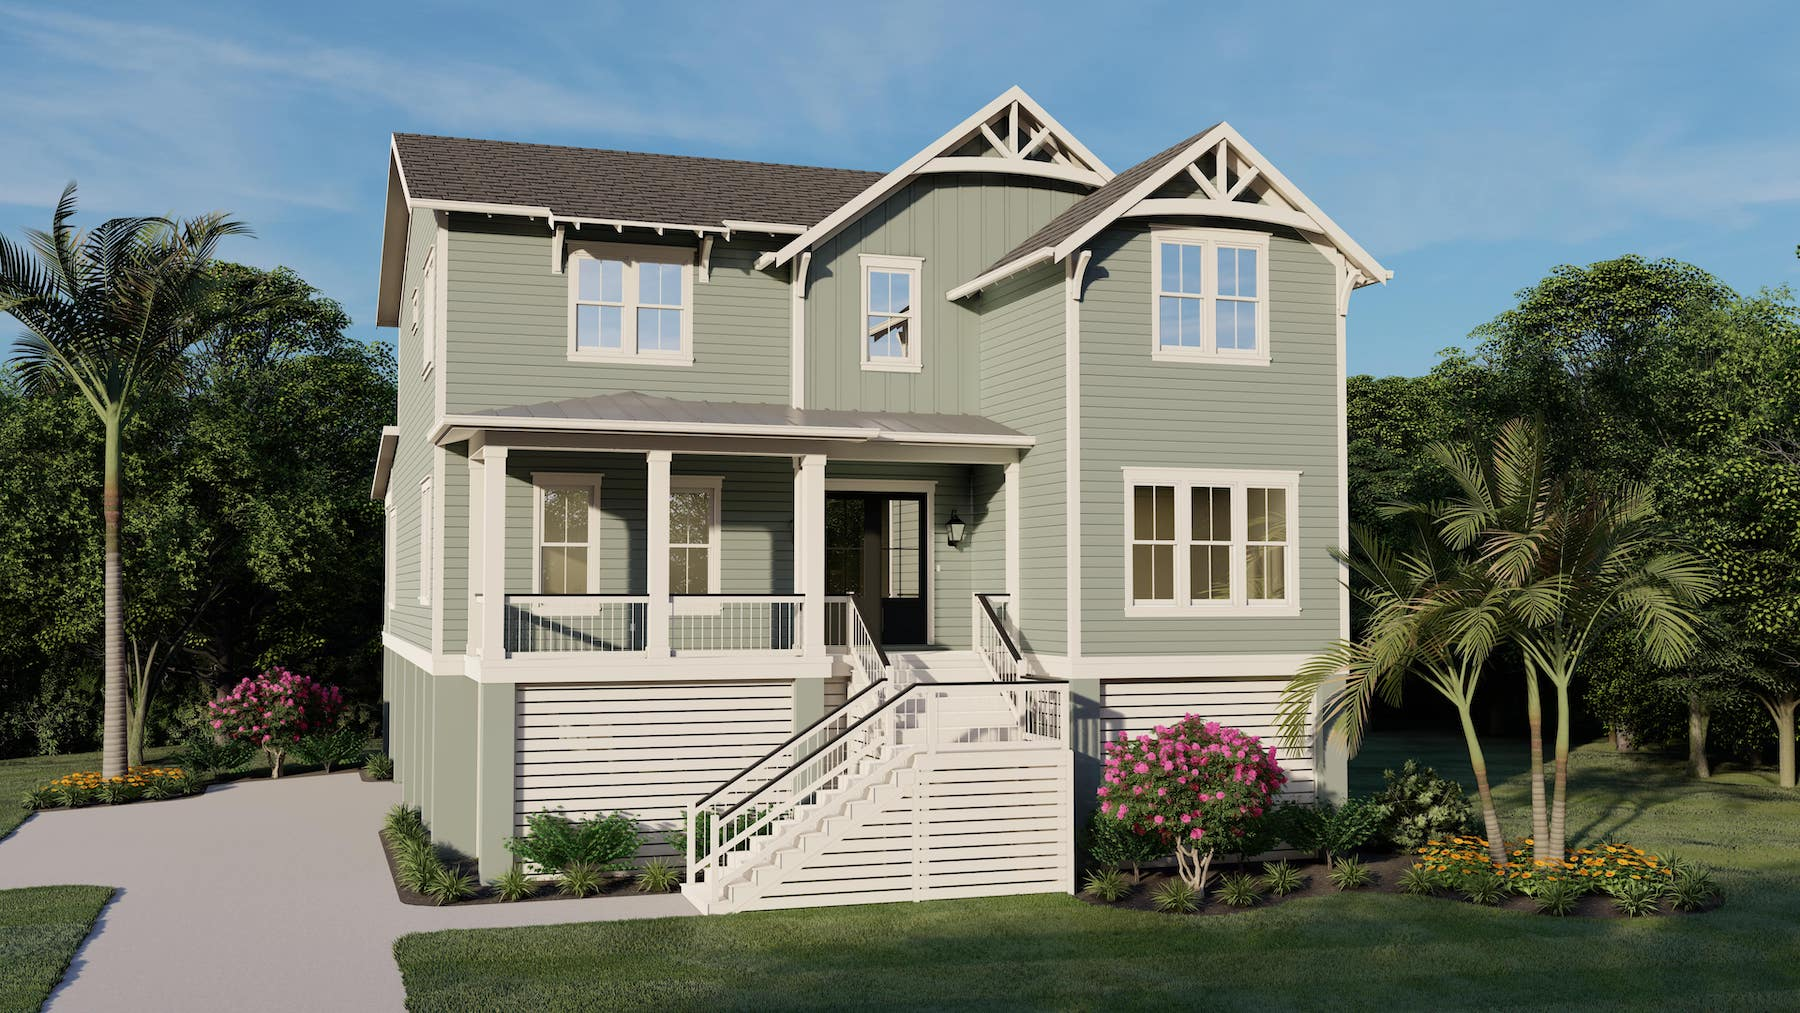 Topsail 1486 Custom Home Plan